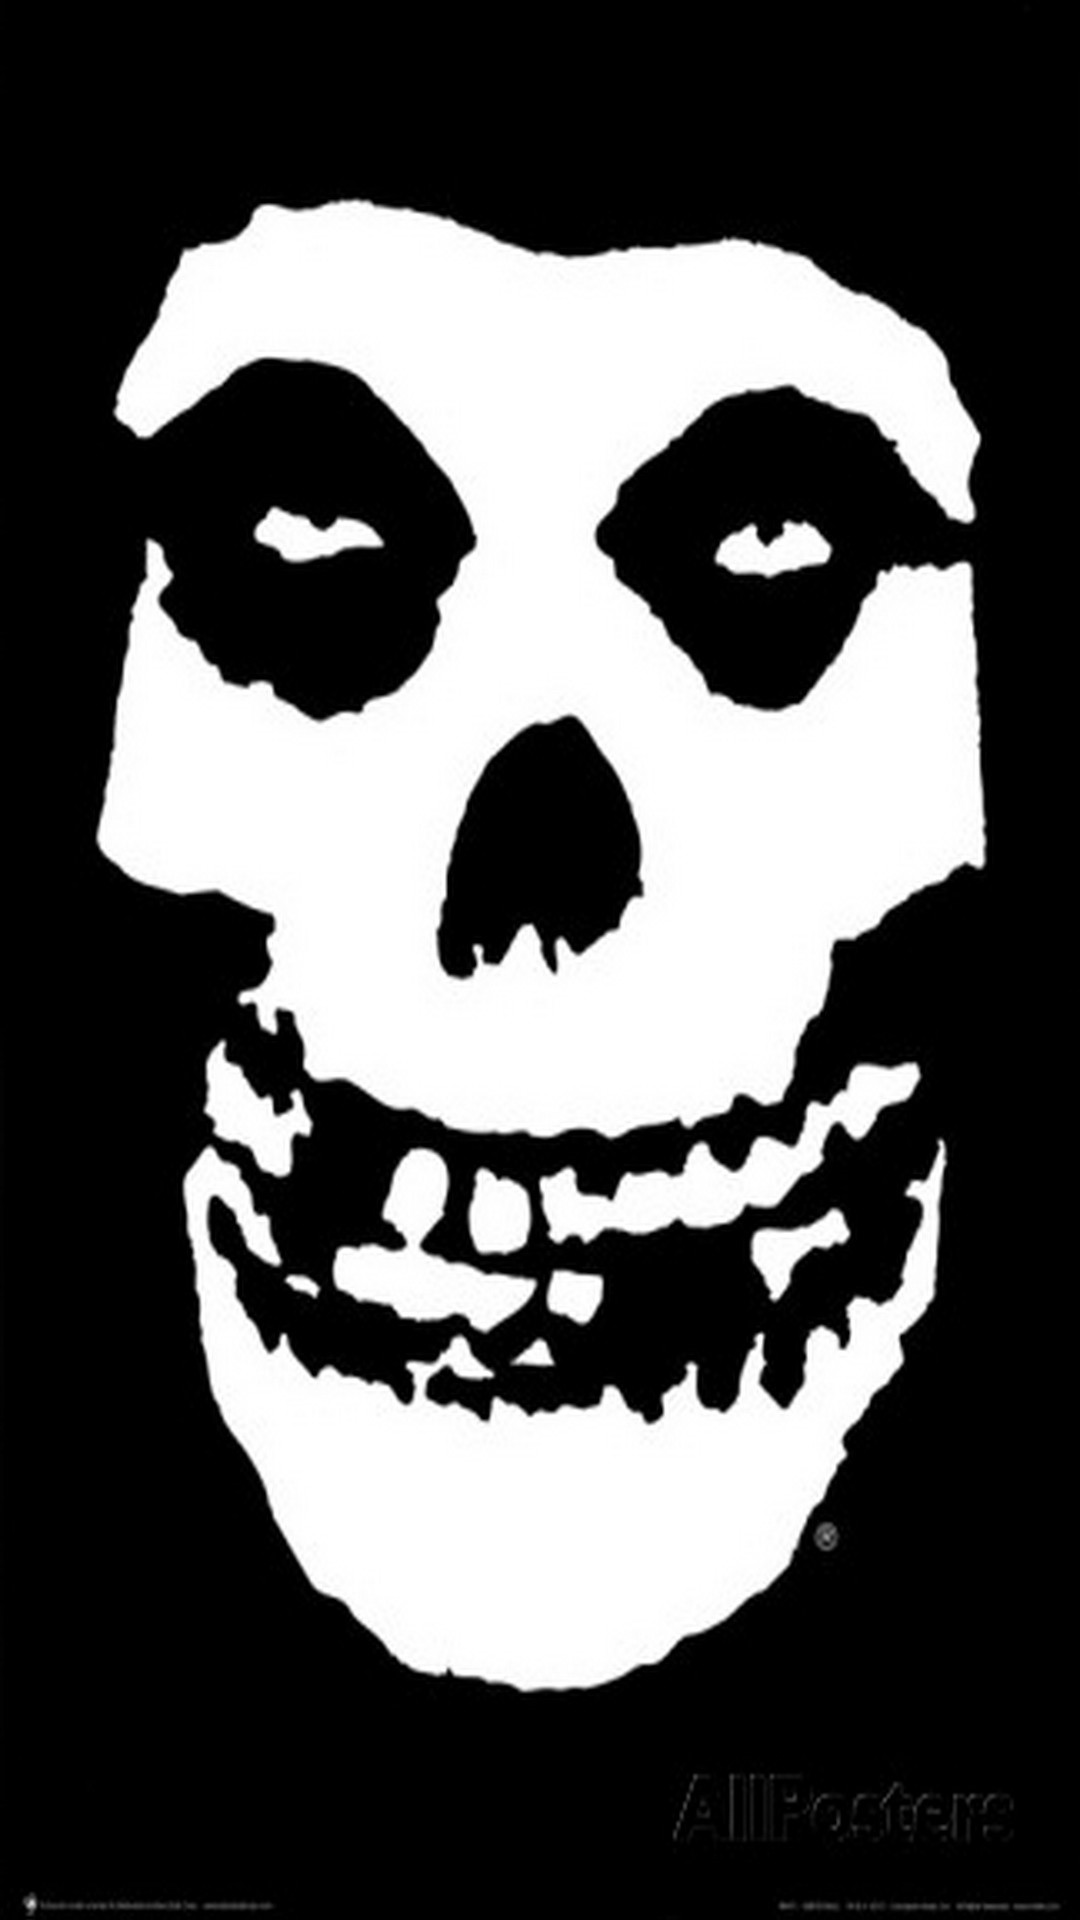 Hd Zombie Girl Wallpaper Misfits Wallpaper Hd 58 Images